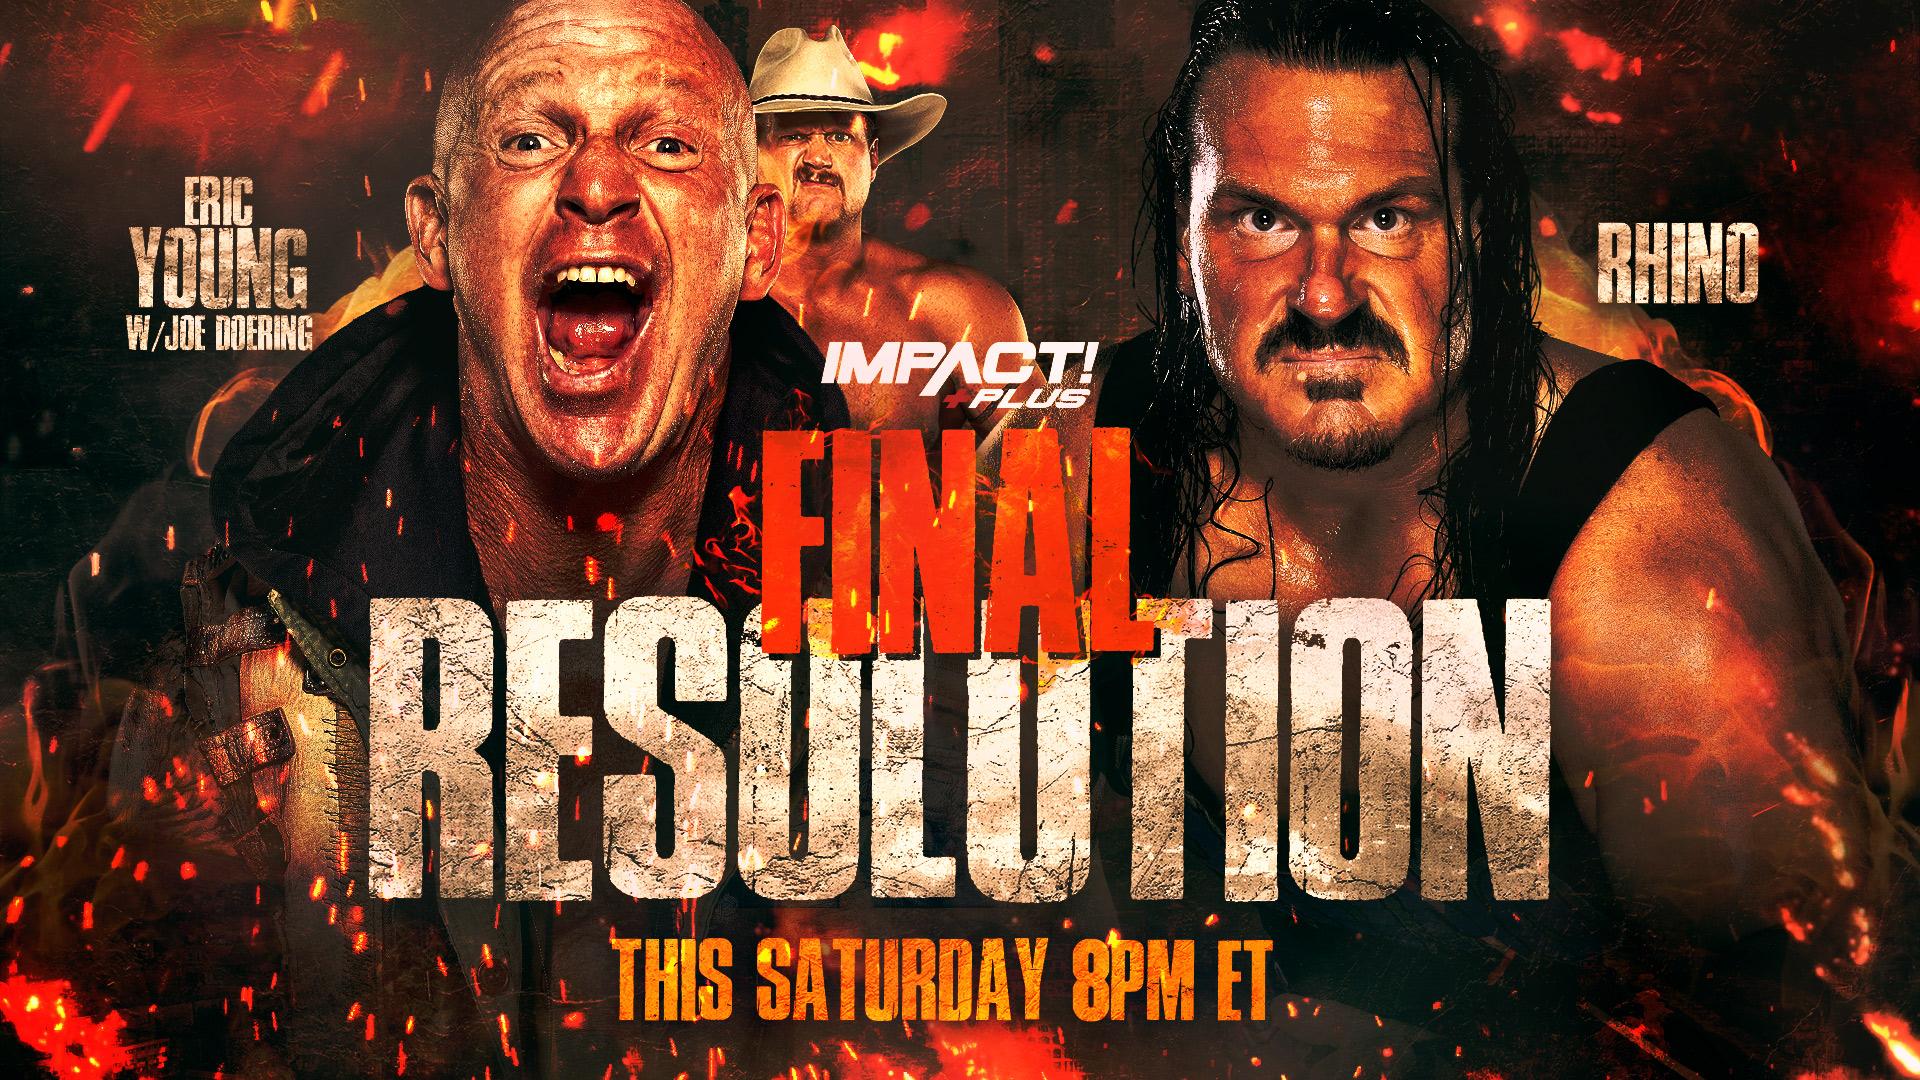 IMPACT Wrestling Presents Final Resolution